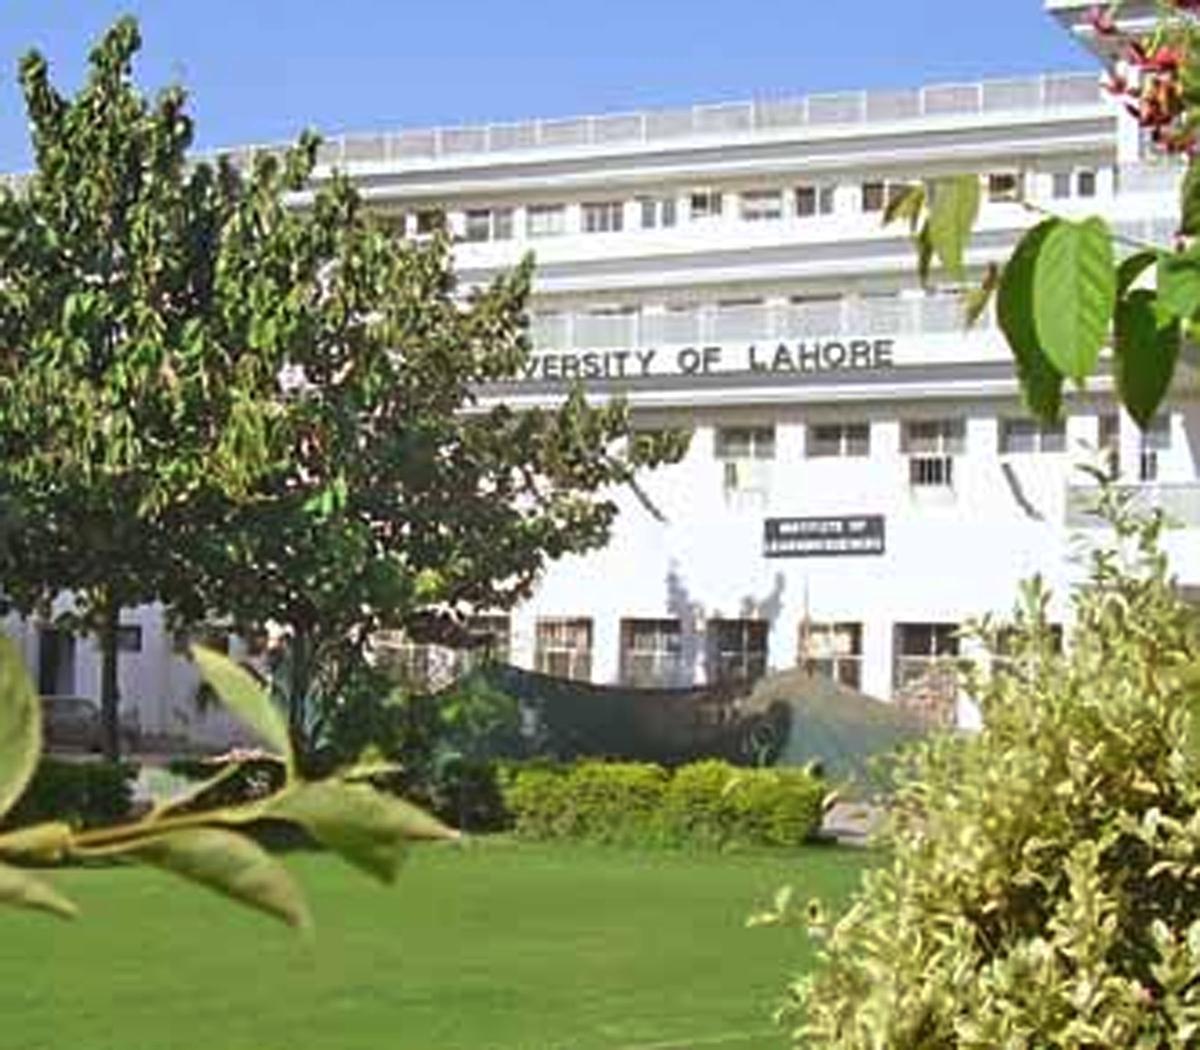 The University of Lahore, Lahore (Main Campus) logo